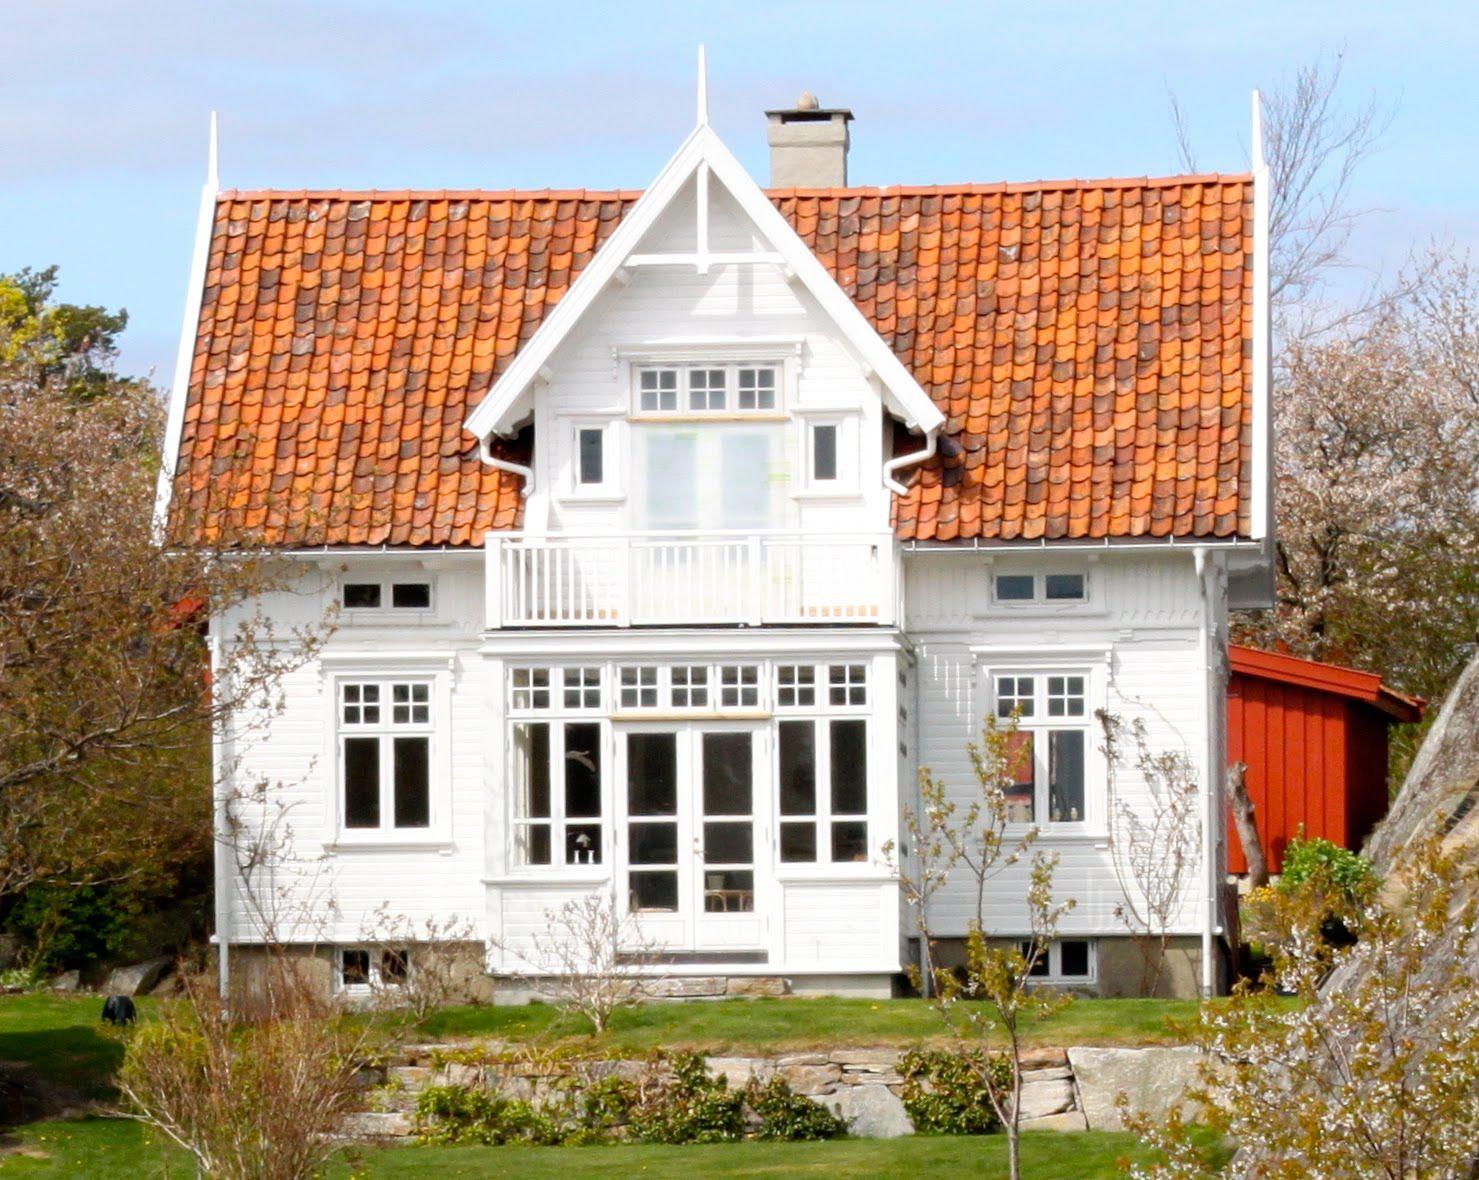 Img 5549 Jpg 1 479 1 180 Bildepunkter Norwegian House House Exterior Norwegian Architecture